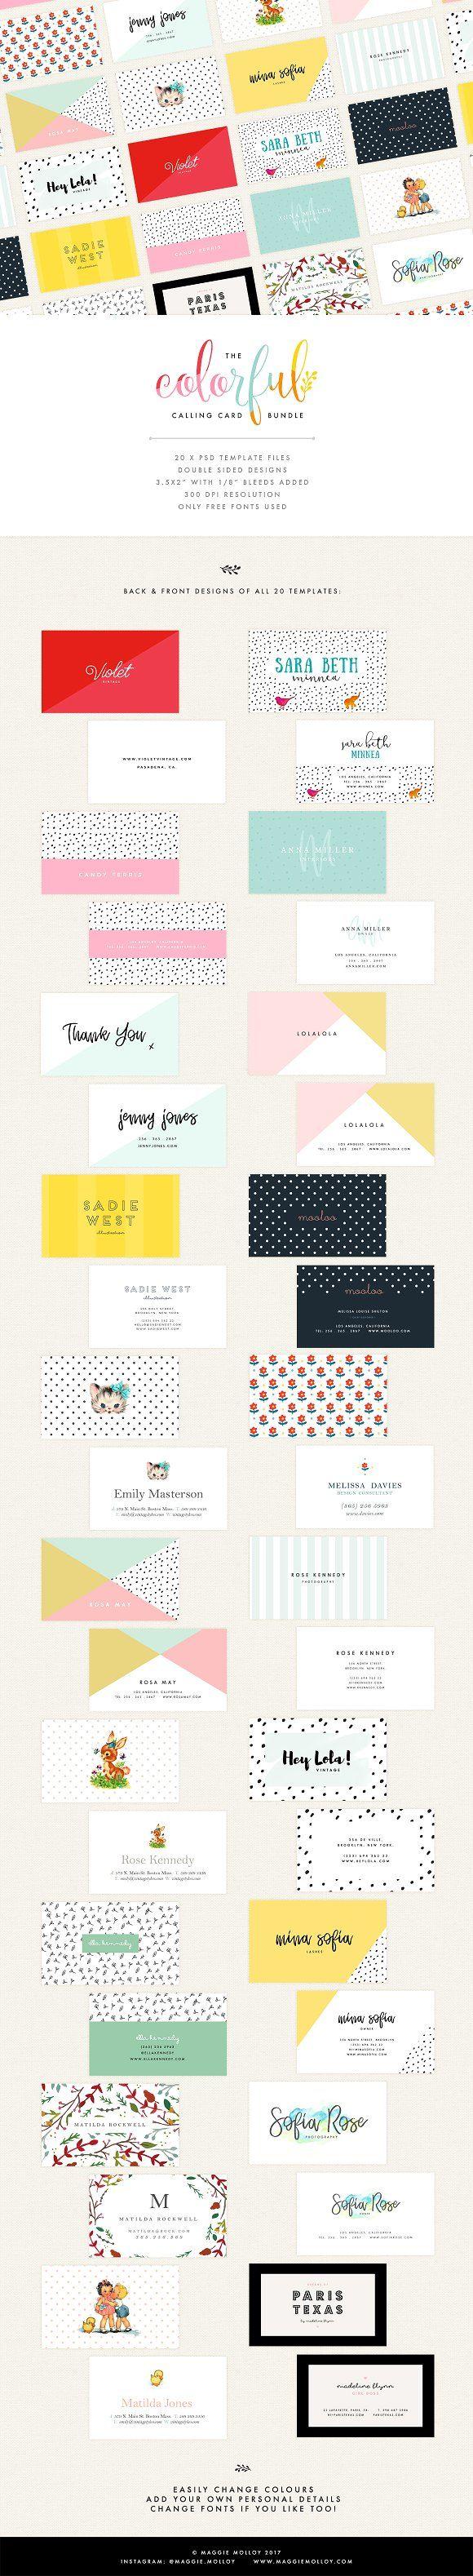 Mejores 14513 imágenes de Best Of Design en Pinterest | Plantillas ...